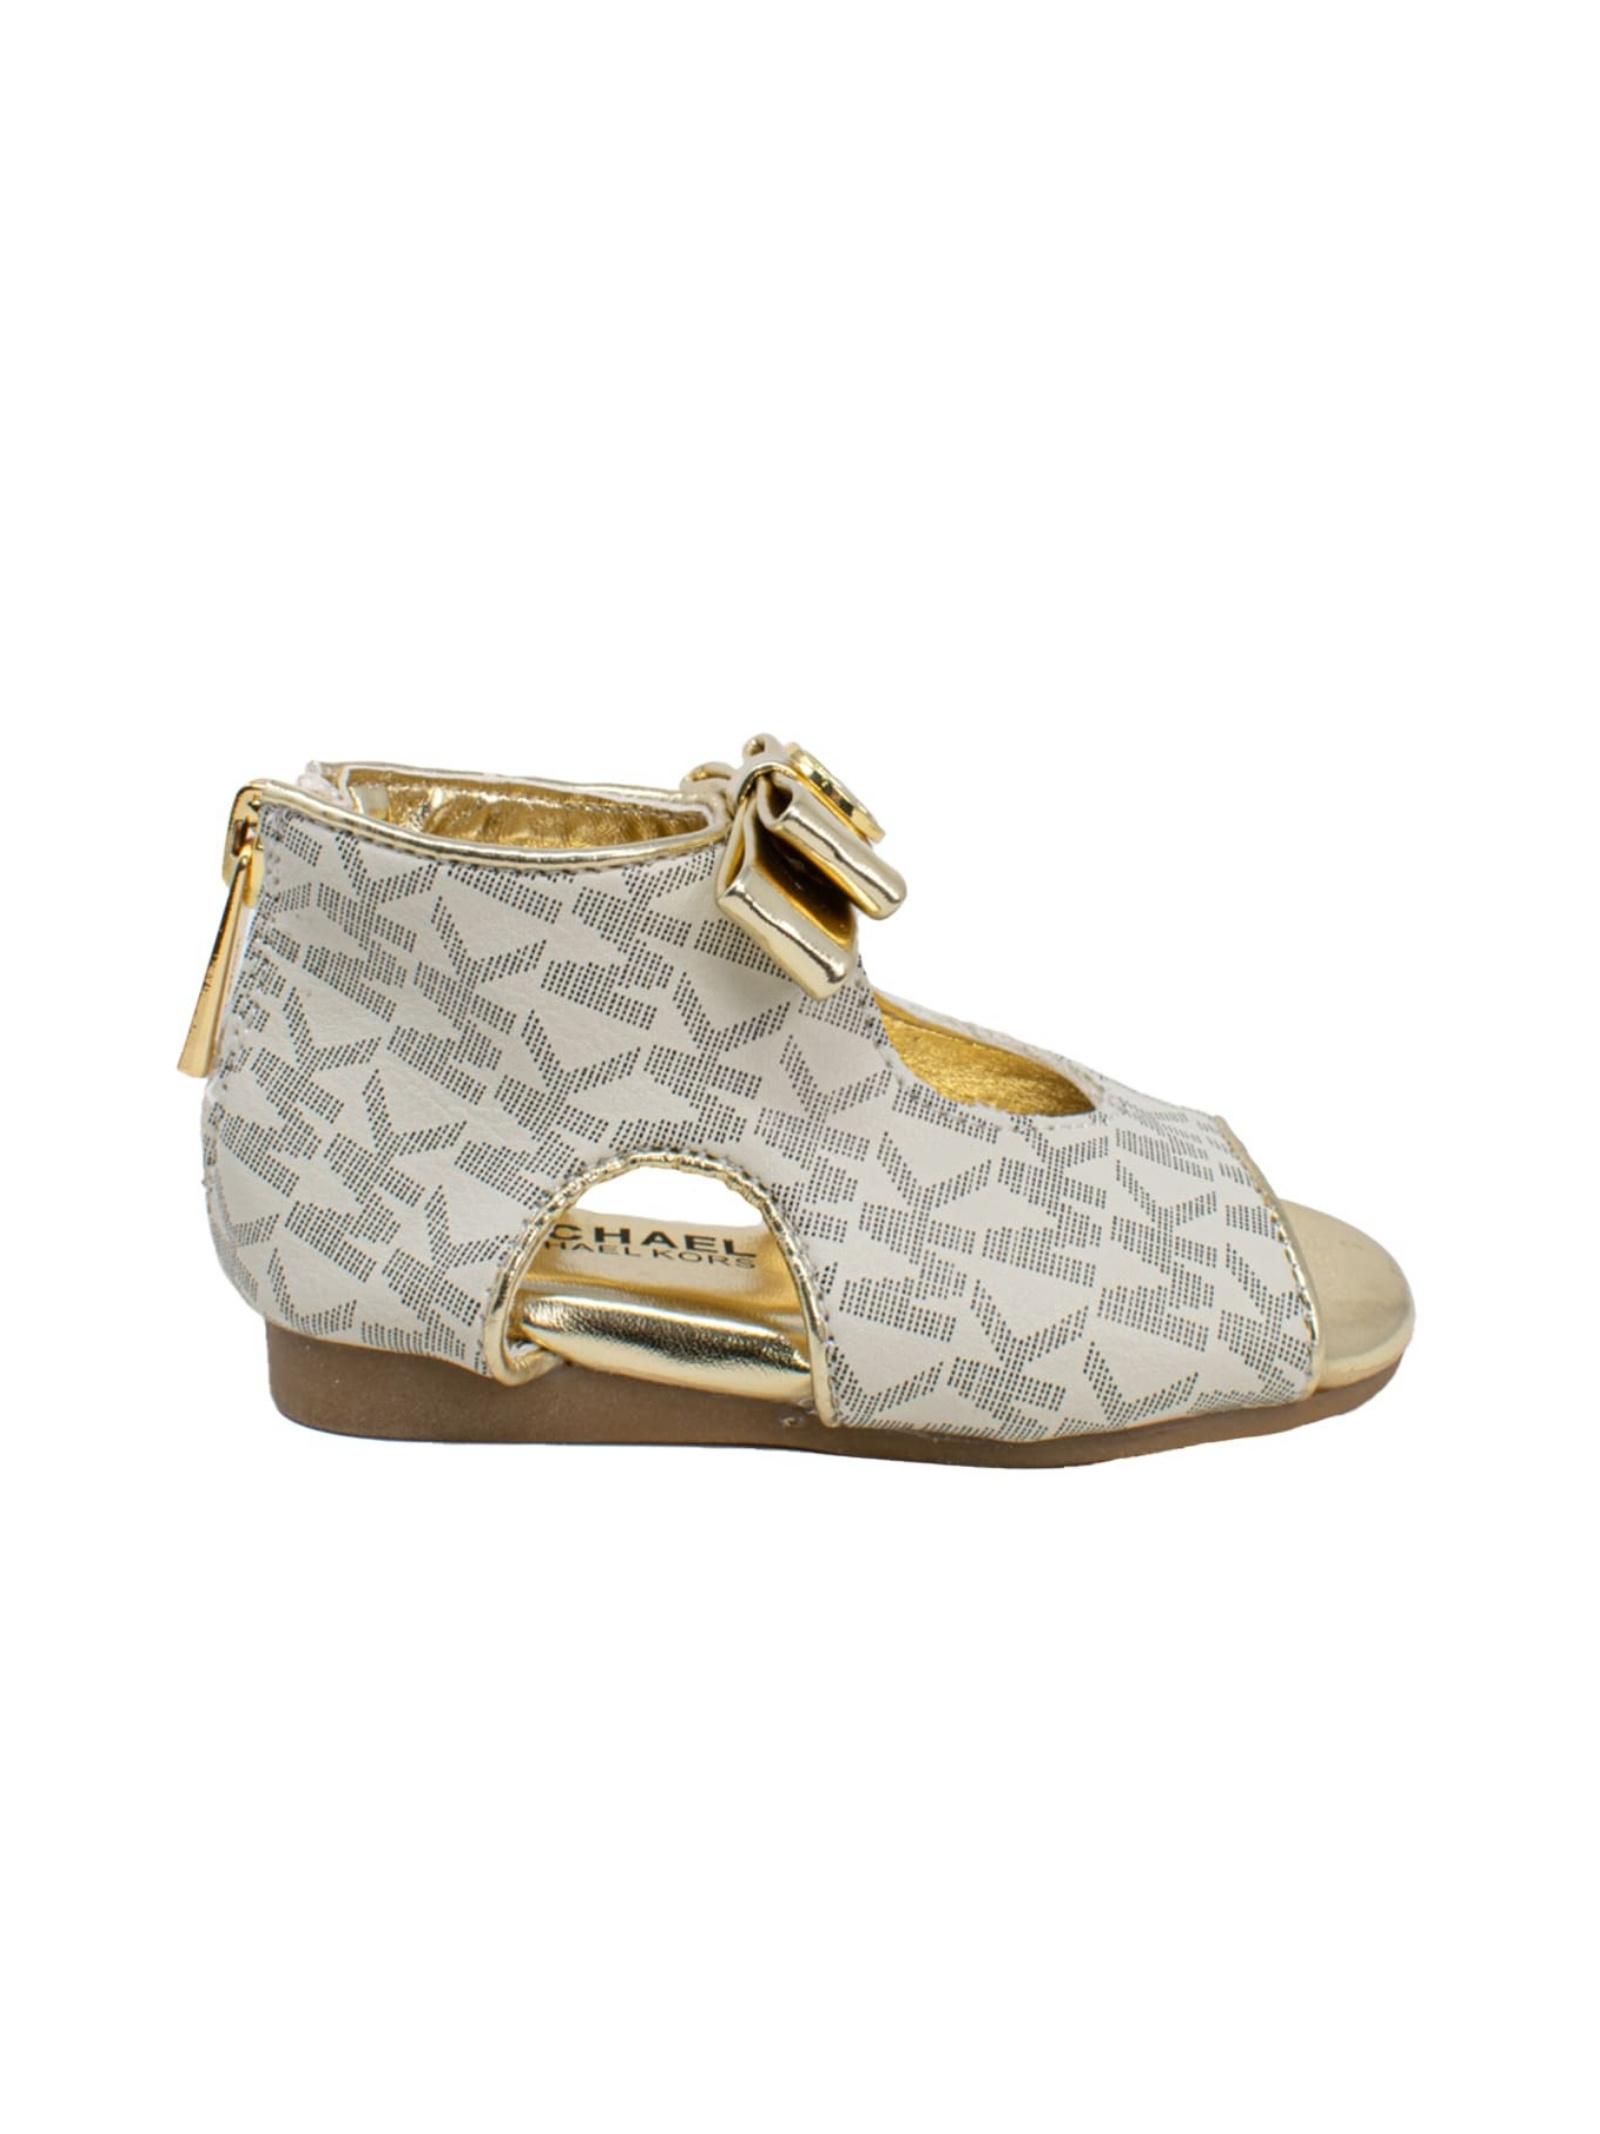 Sandalo Bambina Gold MK MICHAEL KORS JUNIOR | Sandali | MK100061TVANILLA